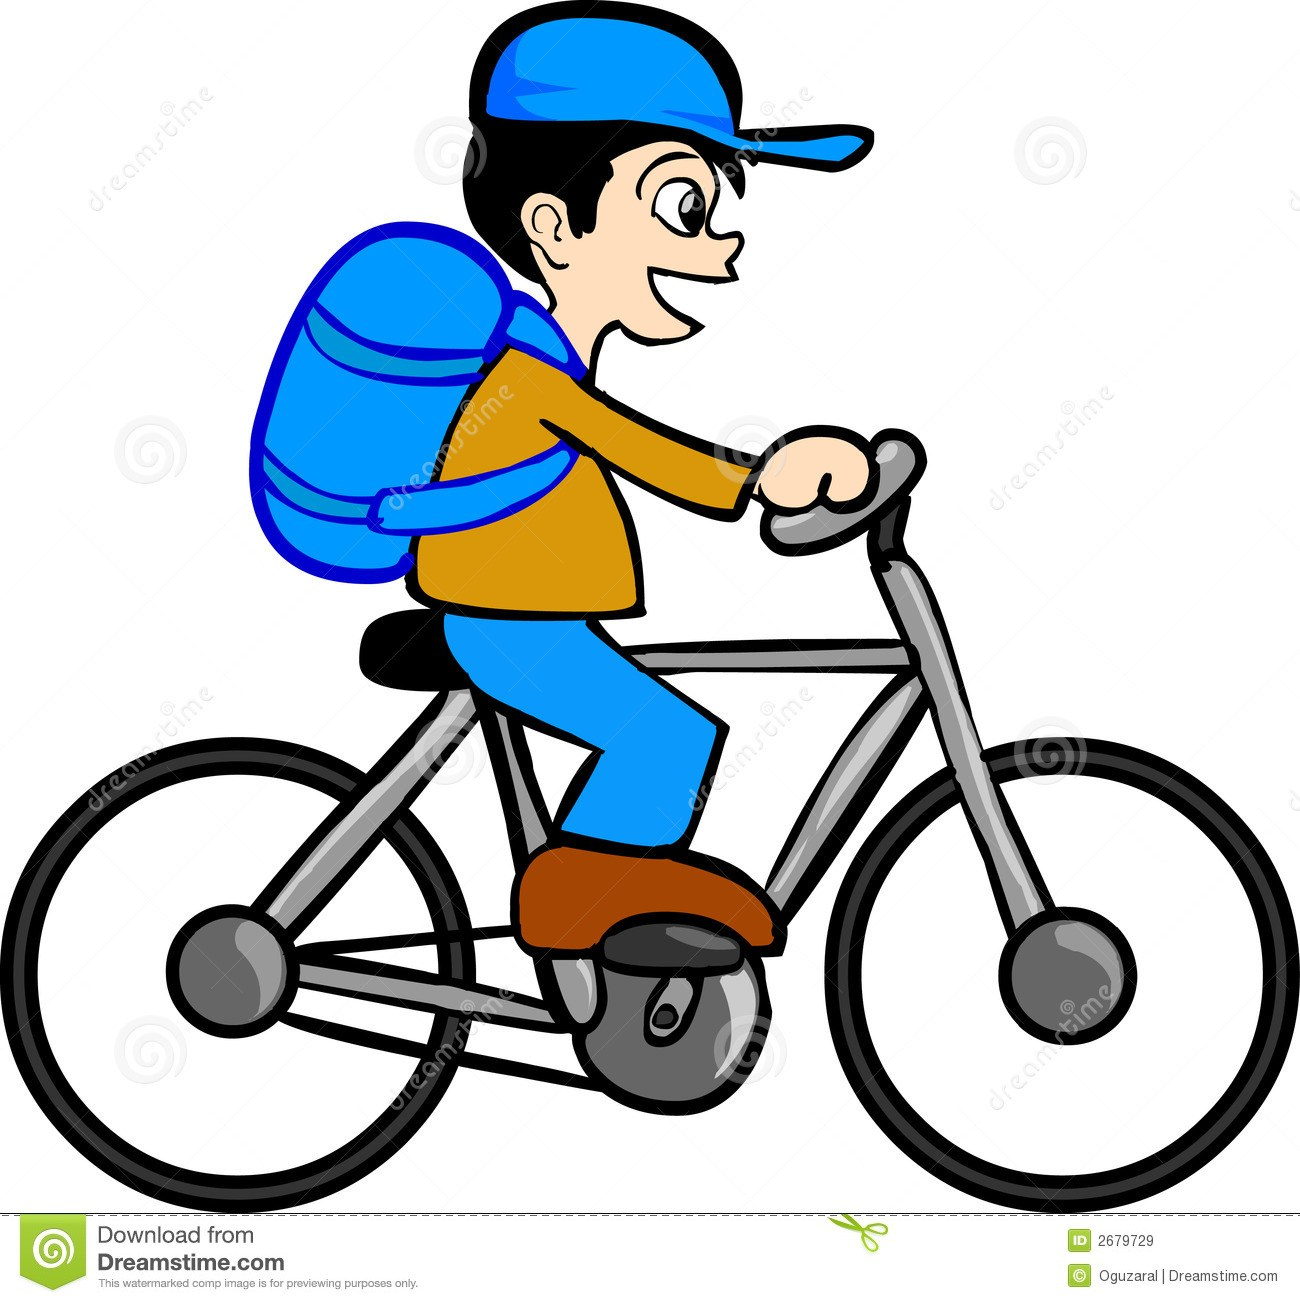 Boy riding bike clipart clip art black and white Boy riding bicycle clipart 8 » Clipart Portal clip art black and white